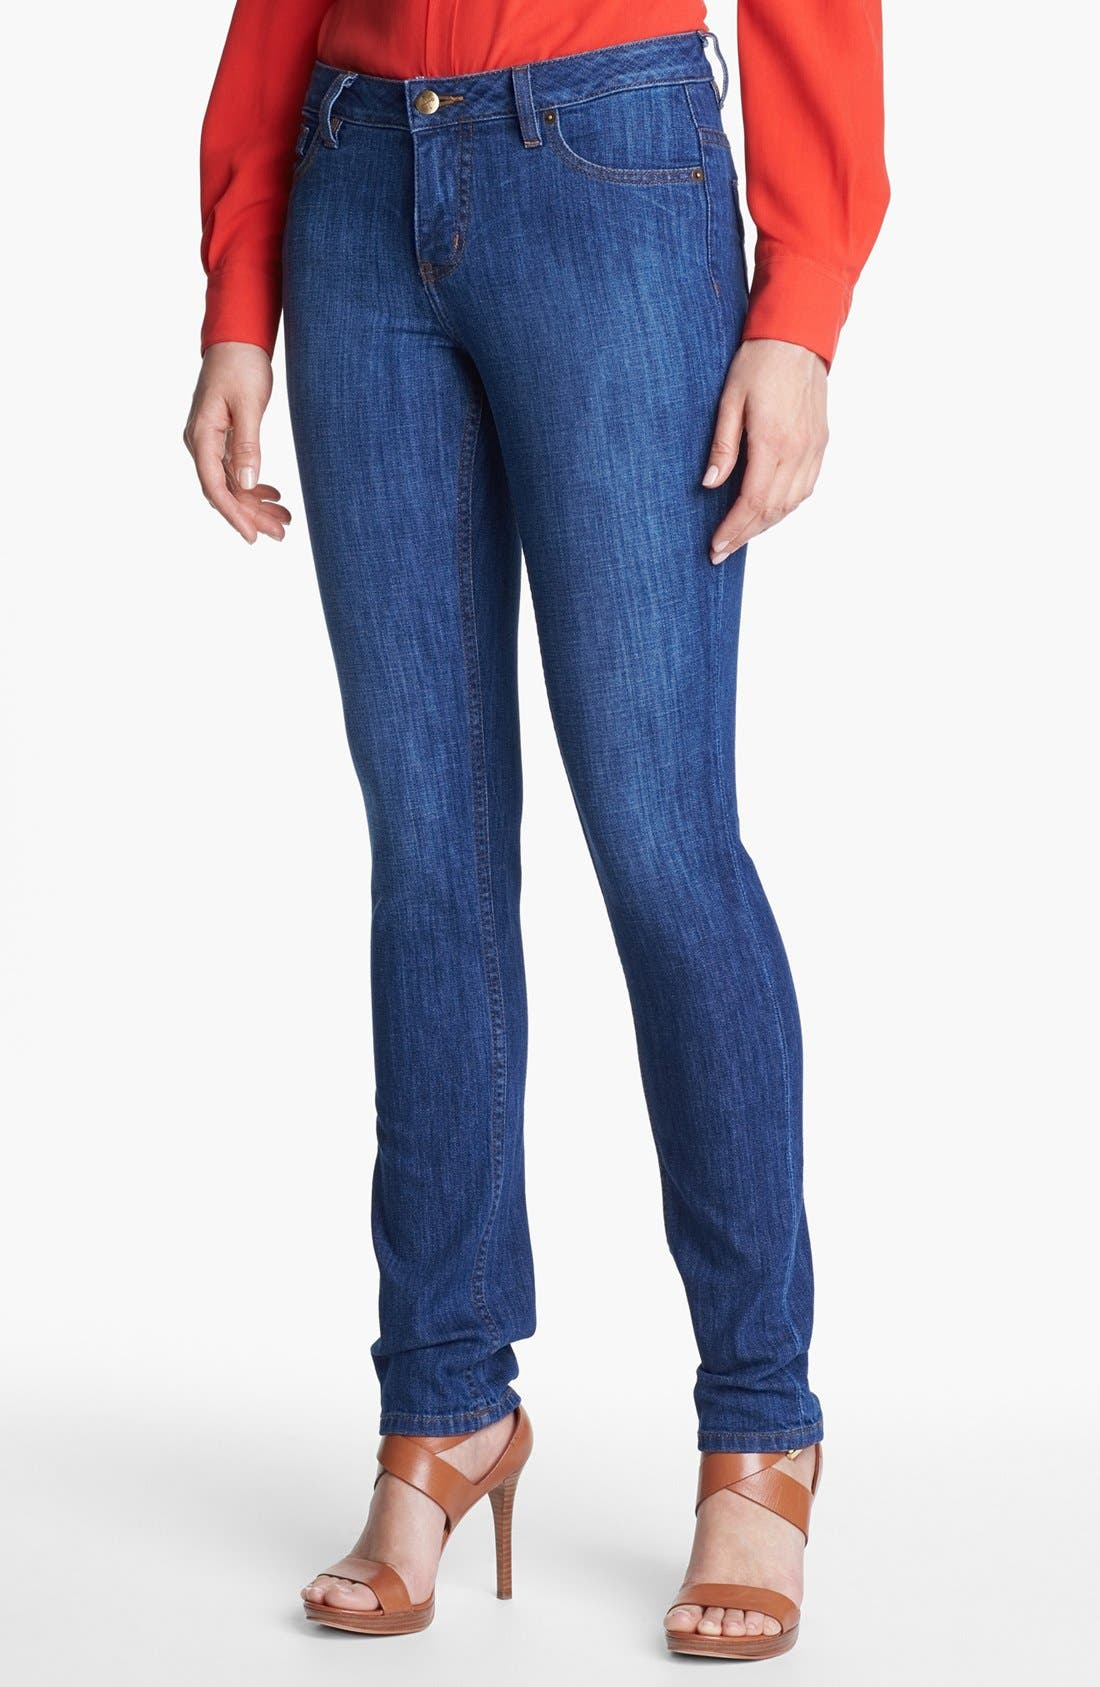 Main Image - Christopher Blue 'Sophia' Skinny Jeans